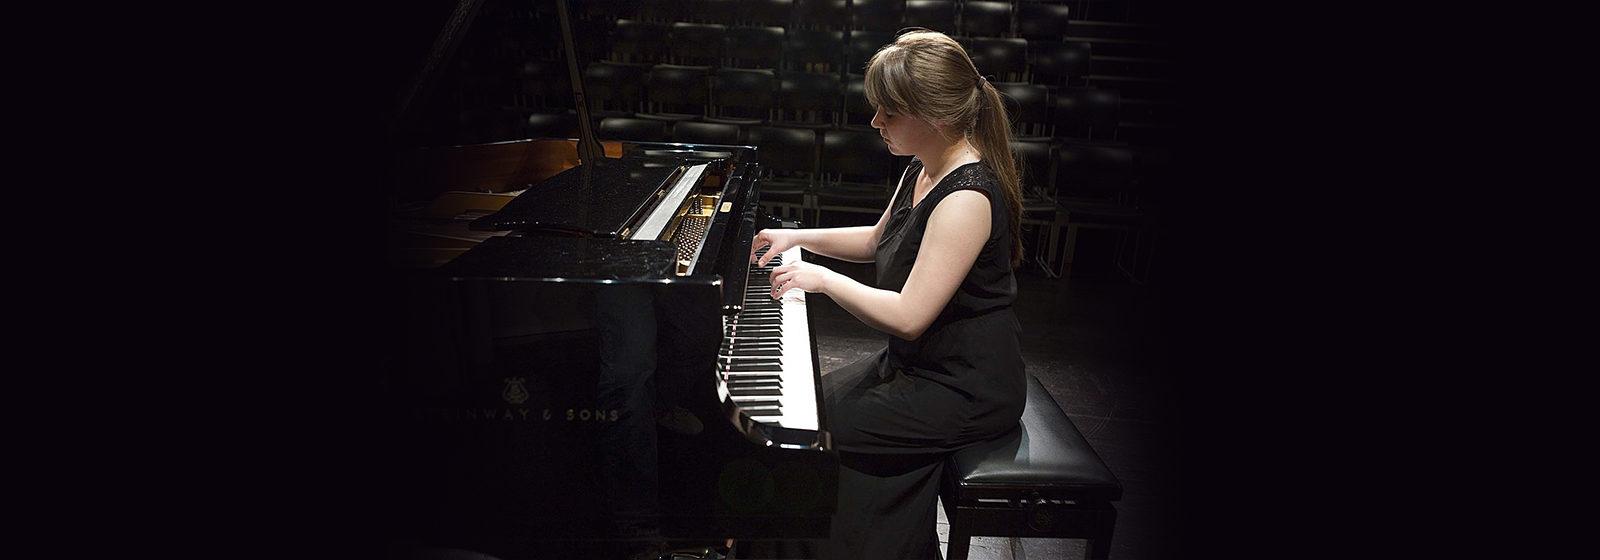 Bizet, Saint-Saens, Berlioz